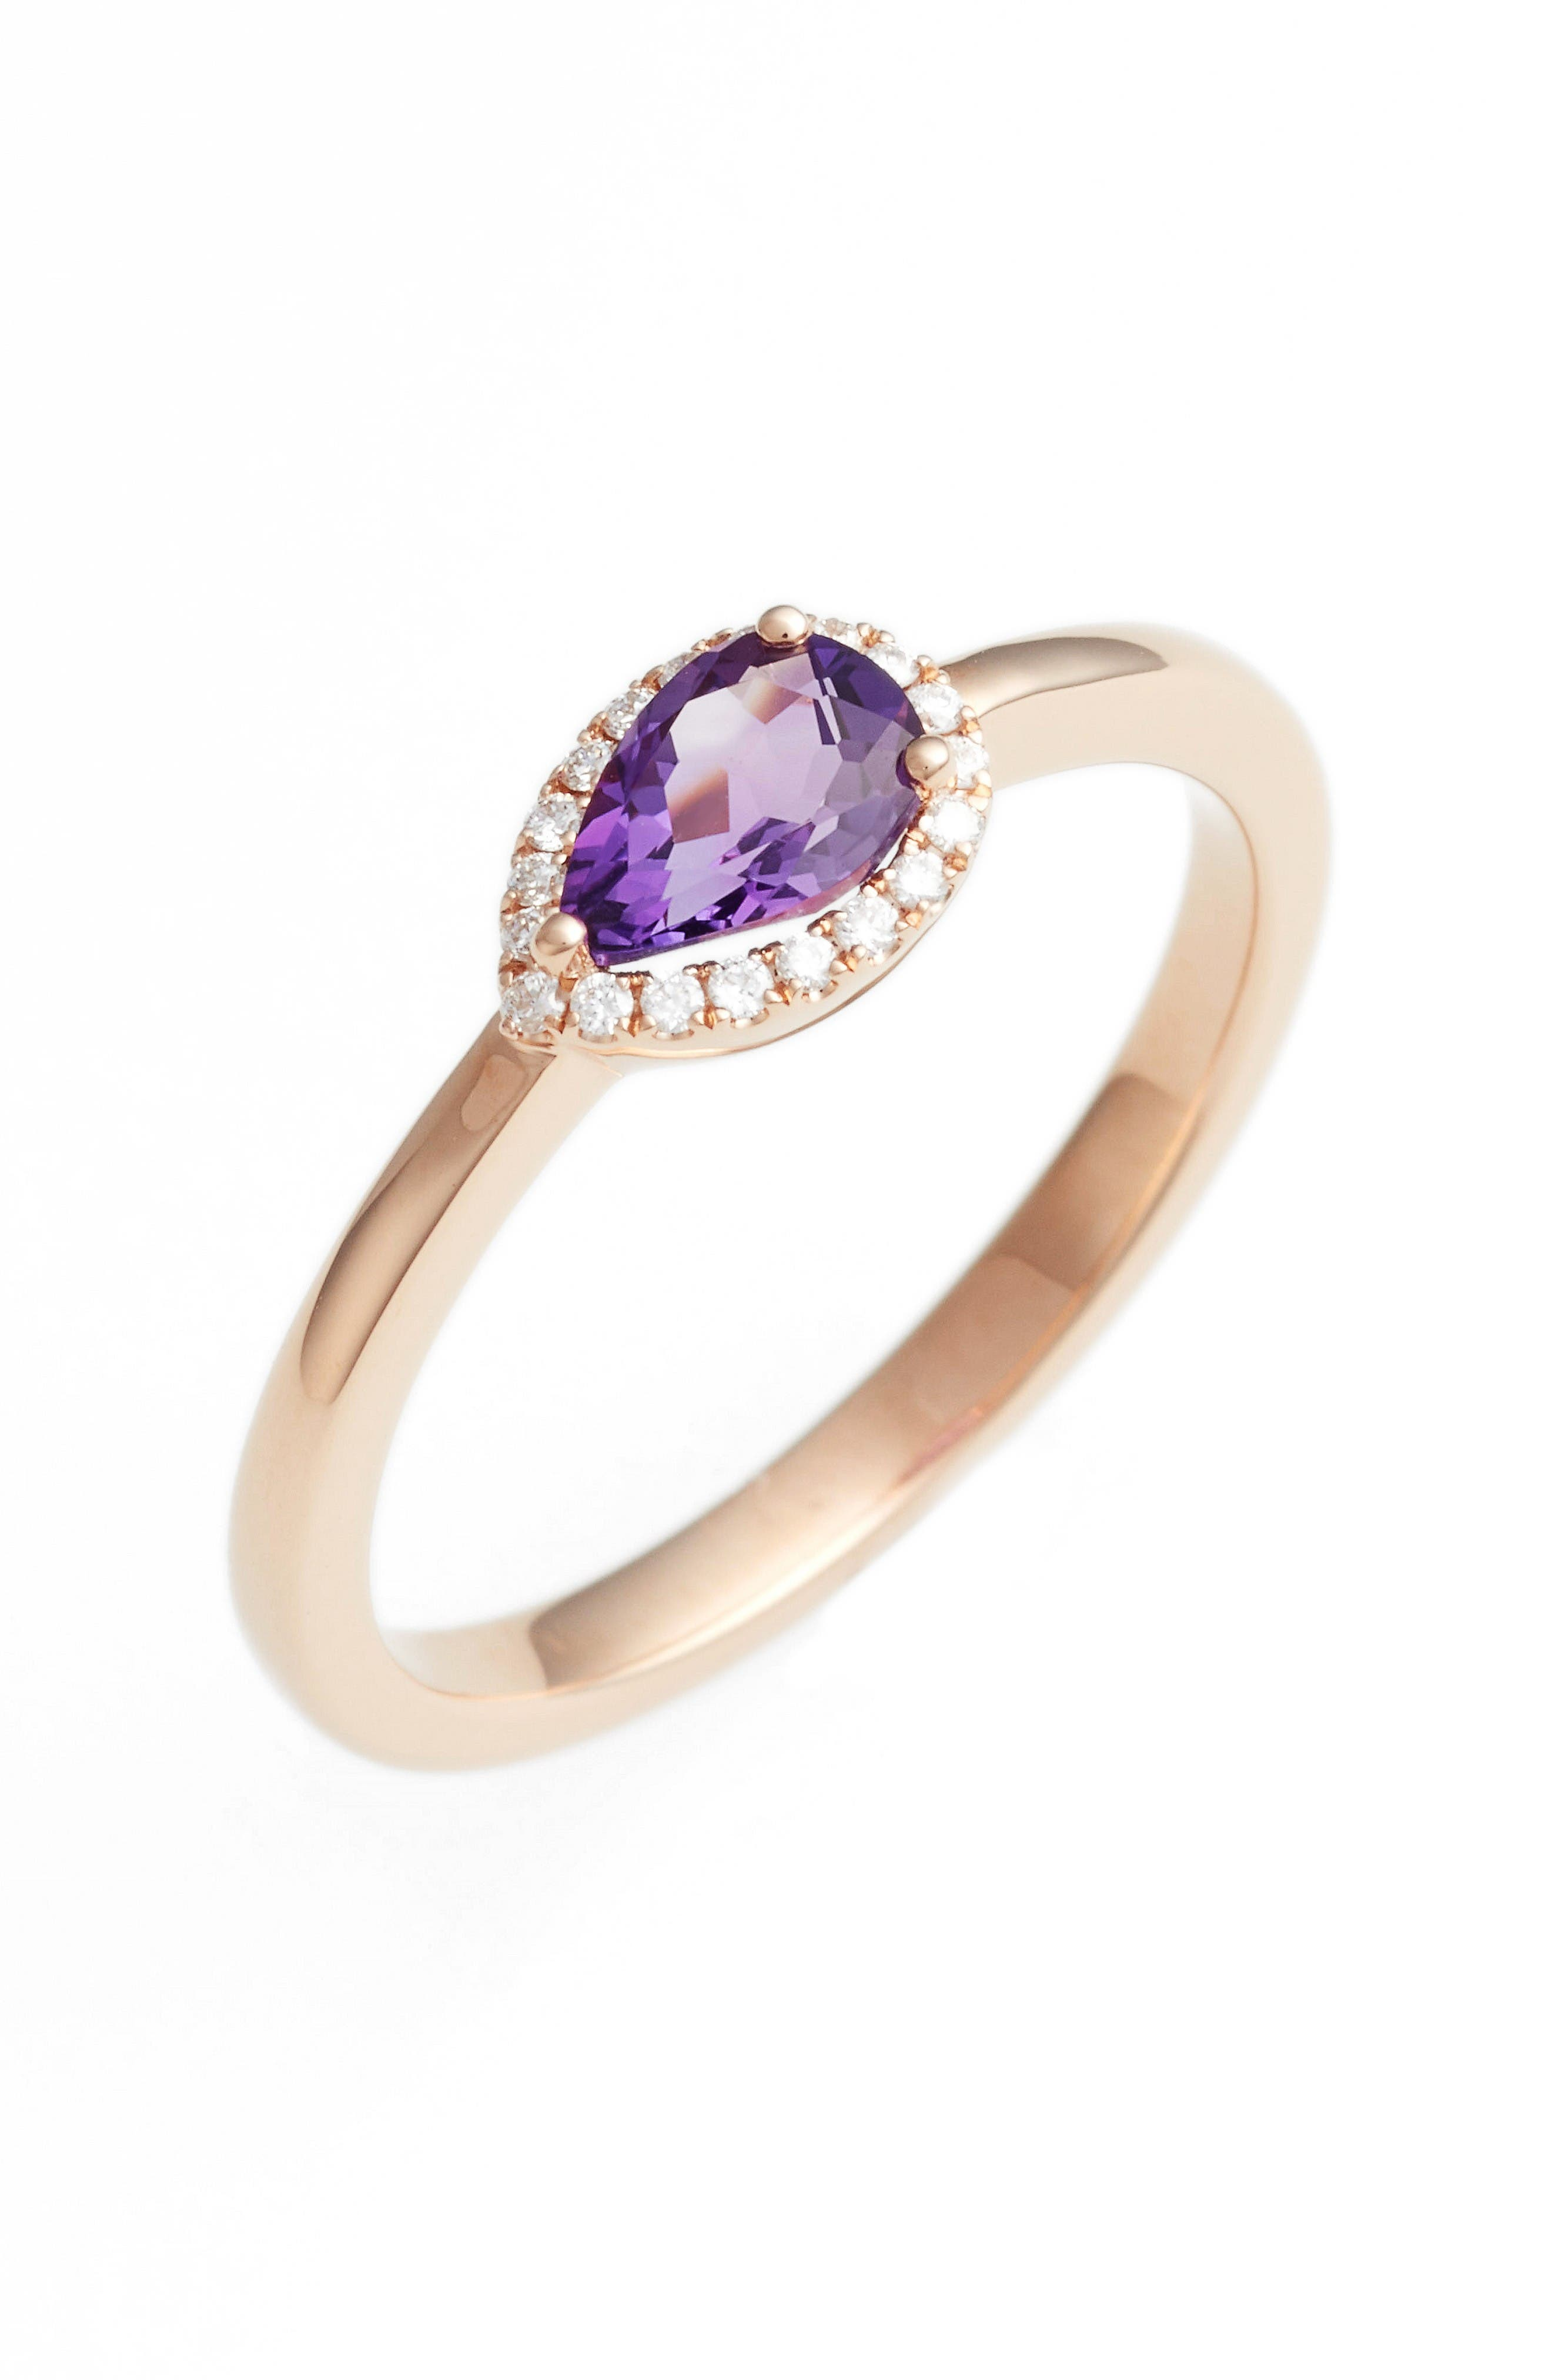 Iris Diamond & Semiprecious Stone Teardrop Ring,                             Main thumbnail 1, color,                             Rose Gold/ Purple Amethyst